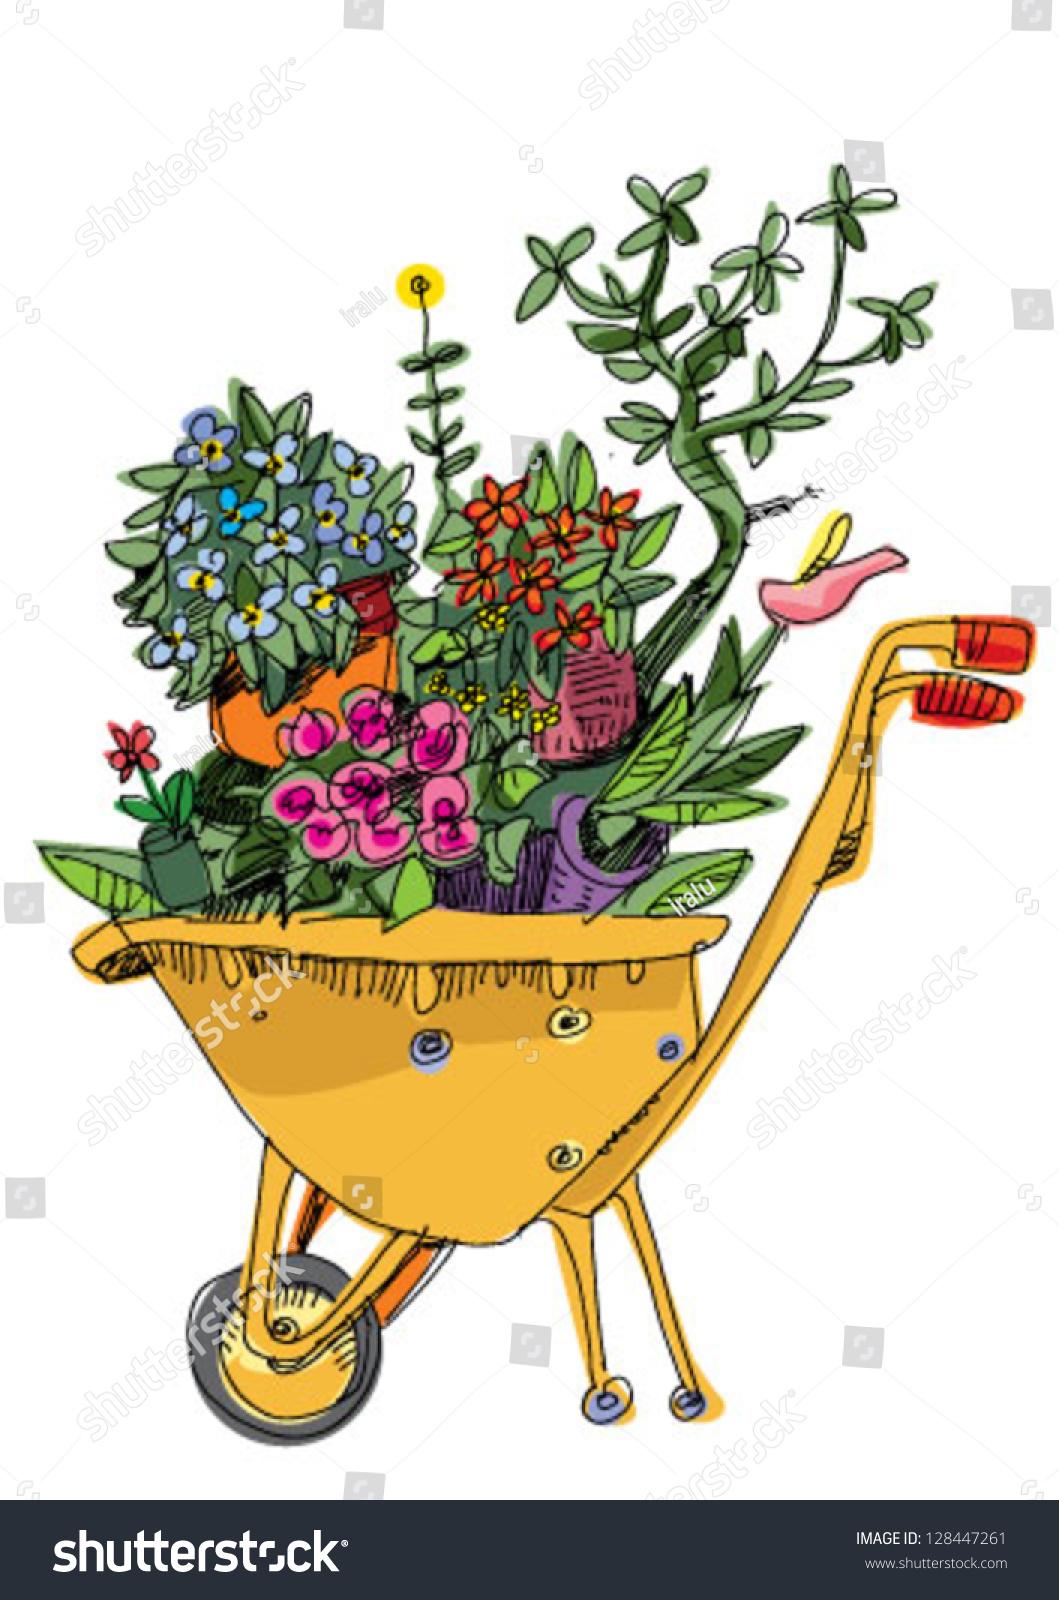 Wheelbarrow Flowers Cartoon Stock Vector 128447261